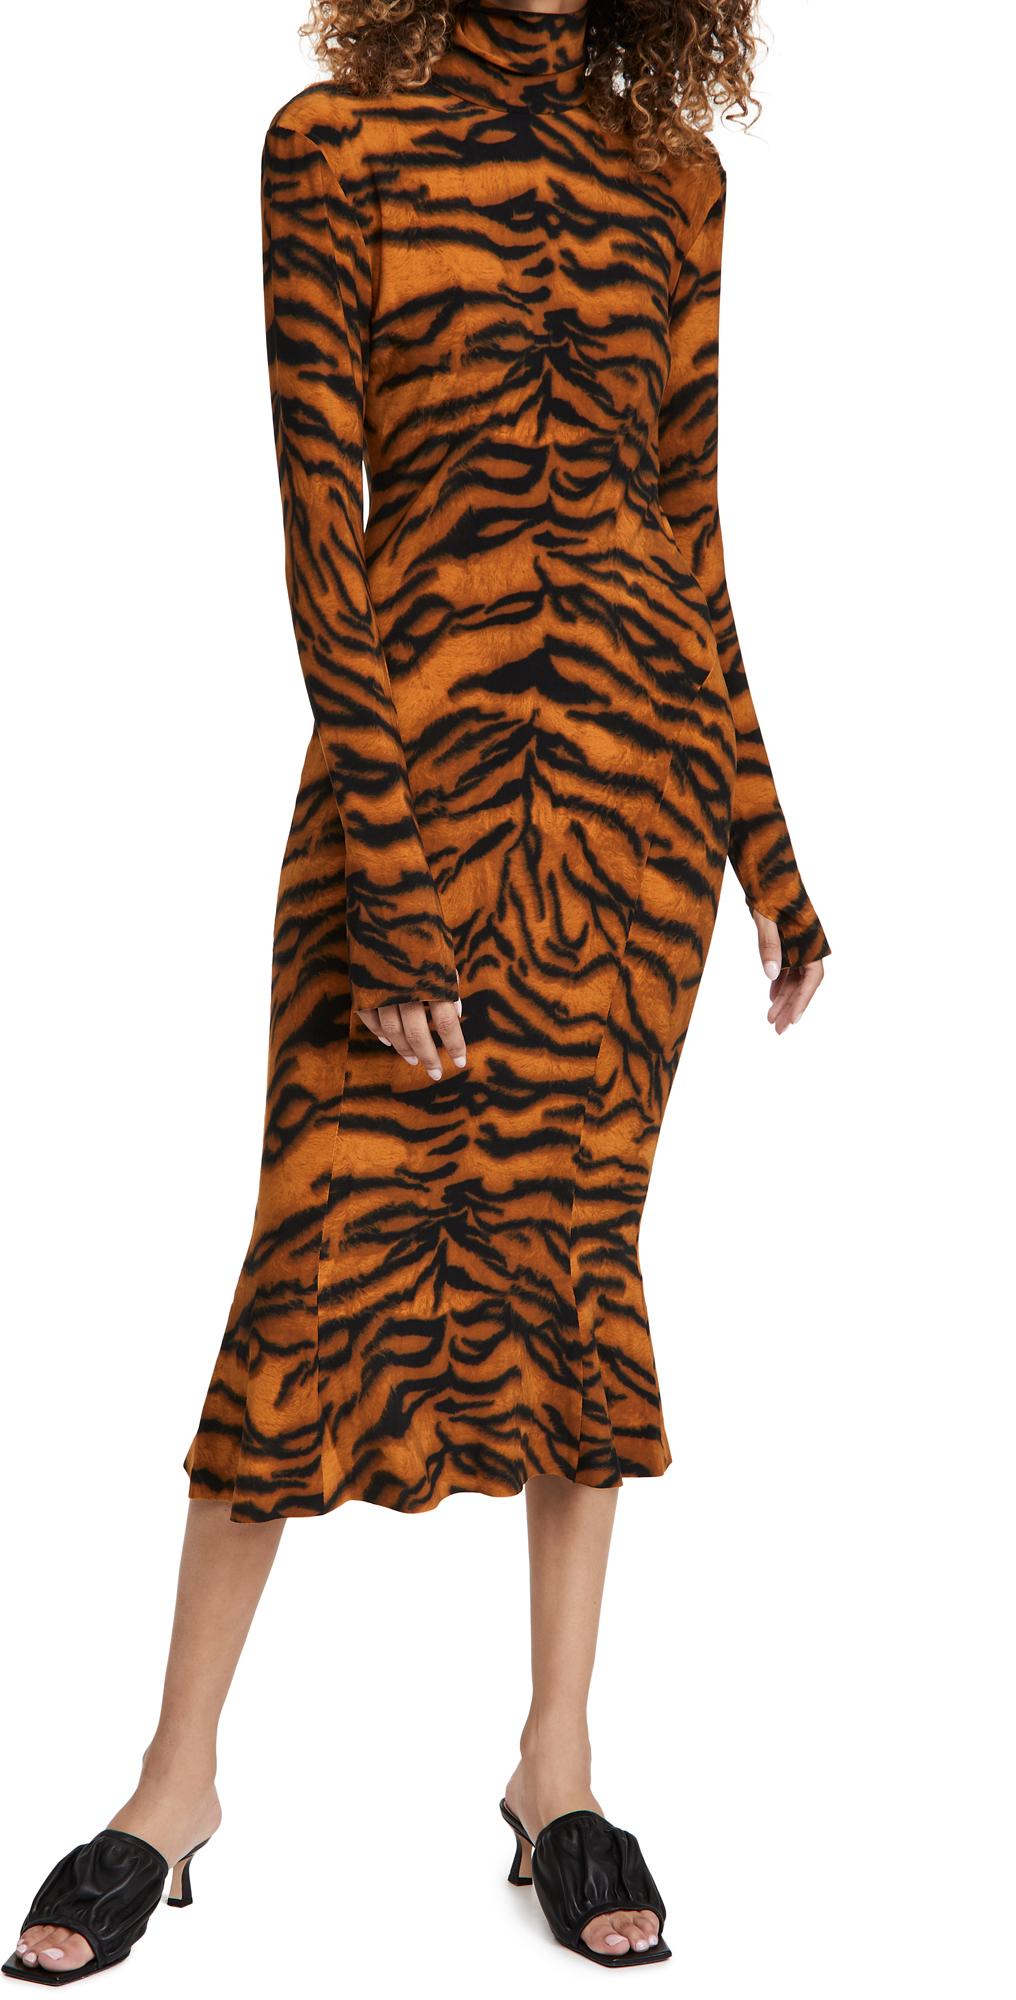 Norma Kamali Long Sleeve Turtle Fishtail Dress